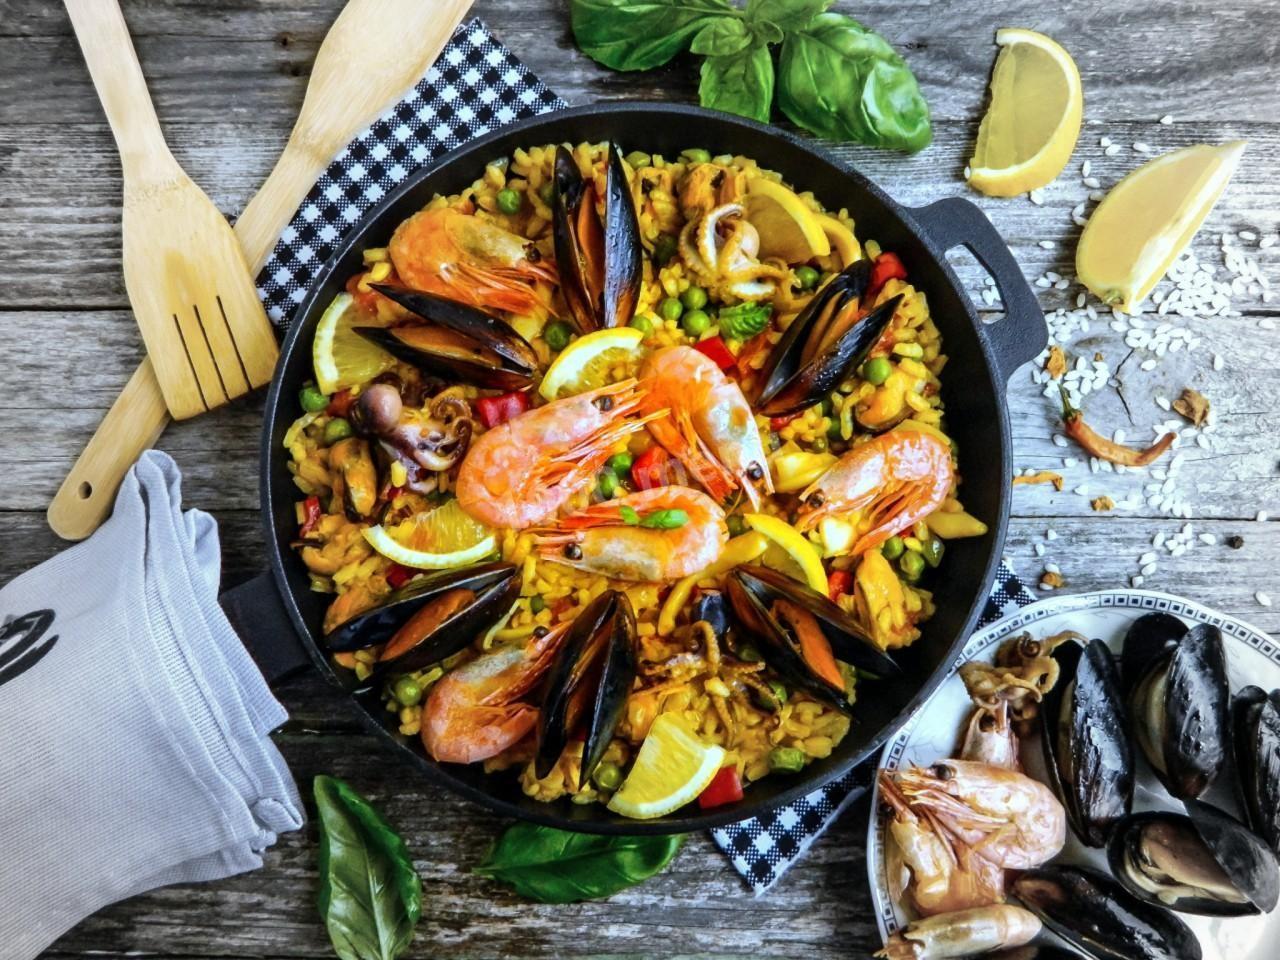 SPANISH PAELLA WITH SEAFOOD CLASSIC